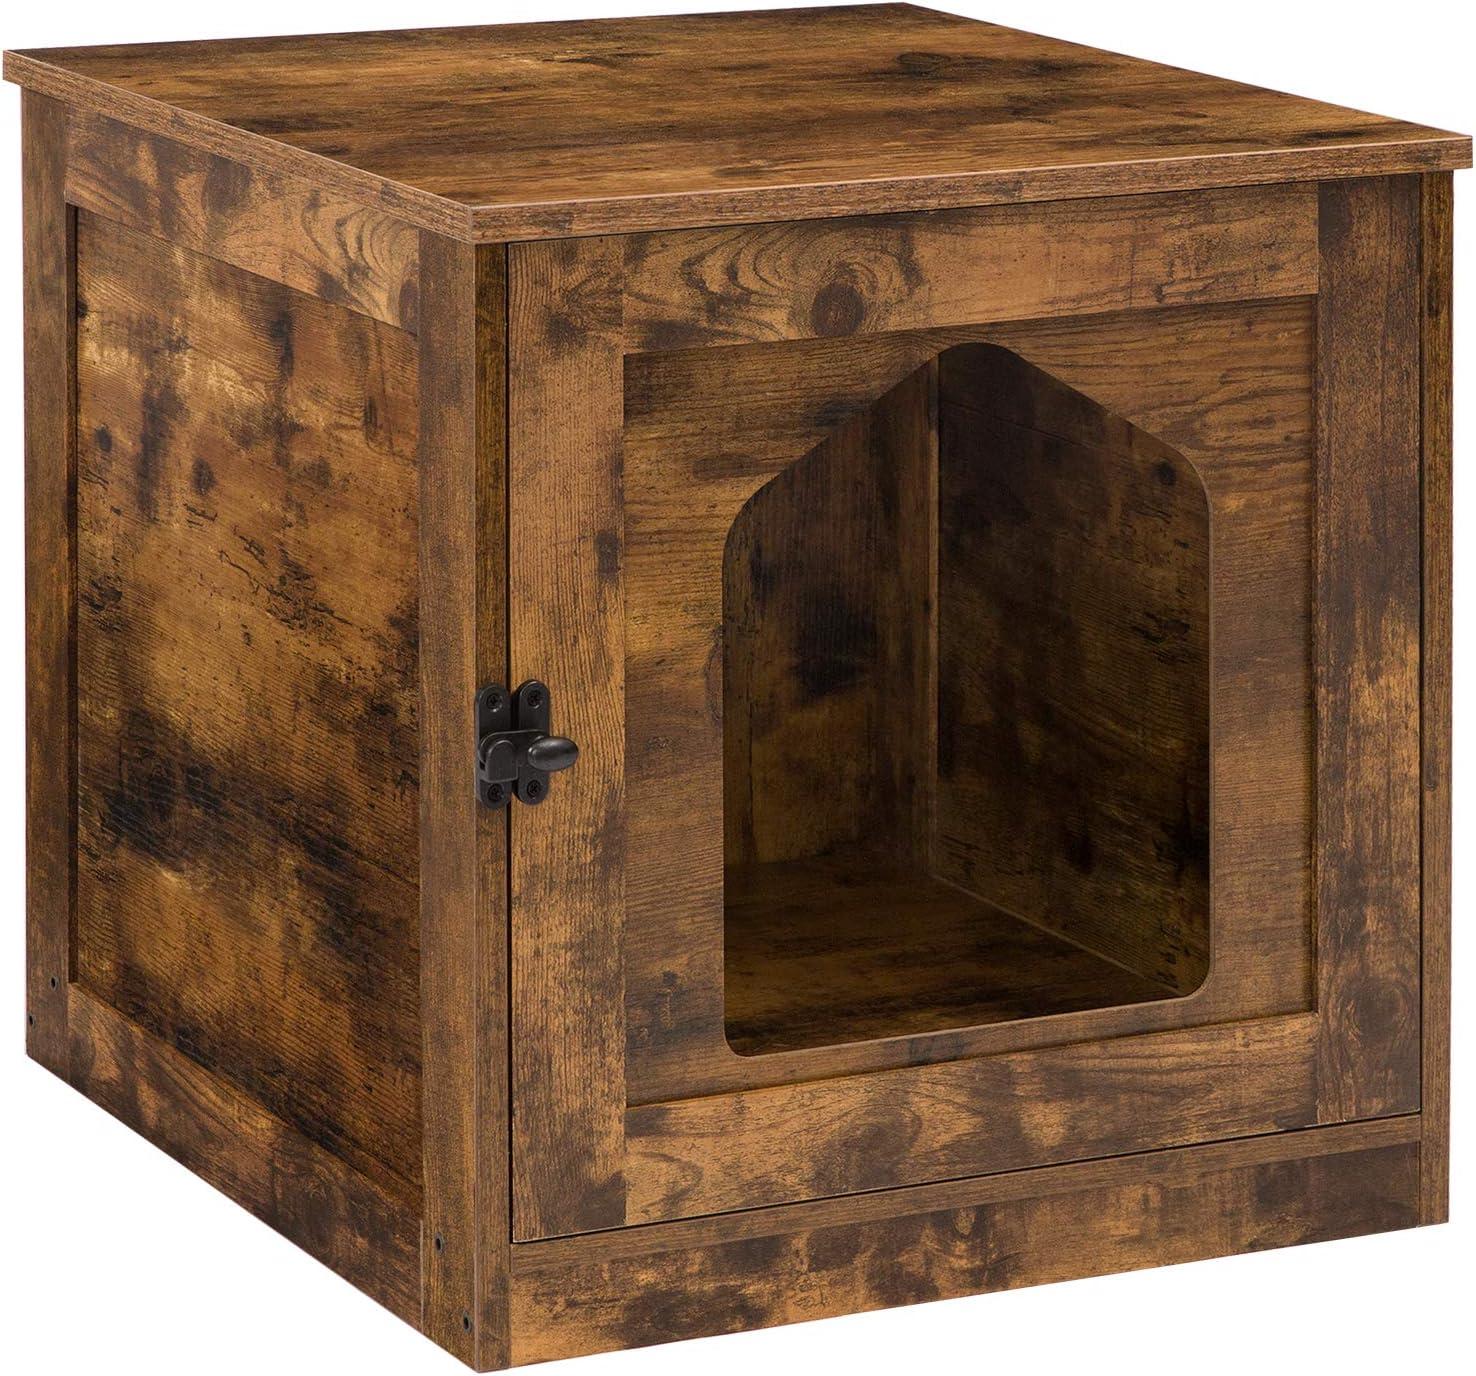 HOOBRO Cat Litter Box Enclosure, Enclosed Cat House Side Table, Hidden Cat Washroom with Door, Enlarged Cat Litter Cabinet for Fat Orange Cat in Living Room Bedroom, Rustic Brown BF01MW01